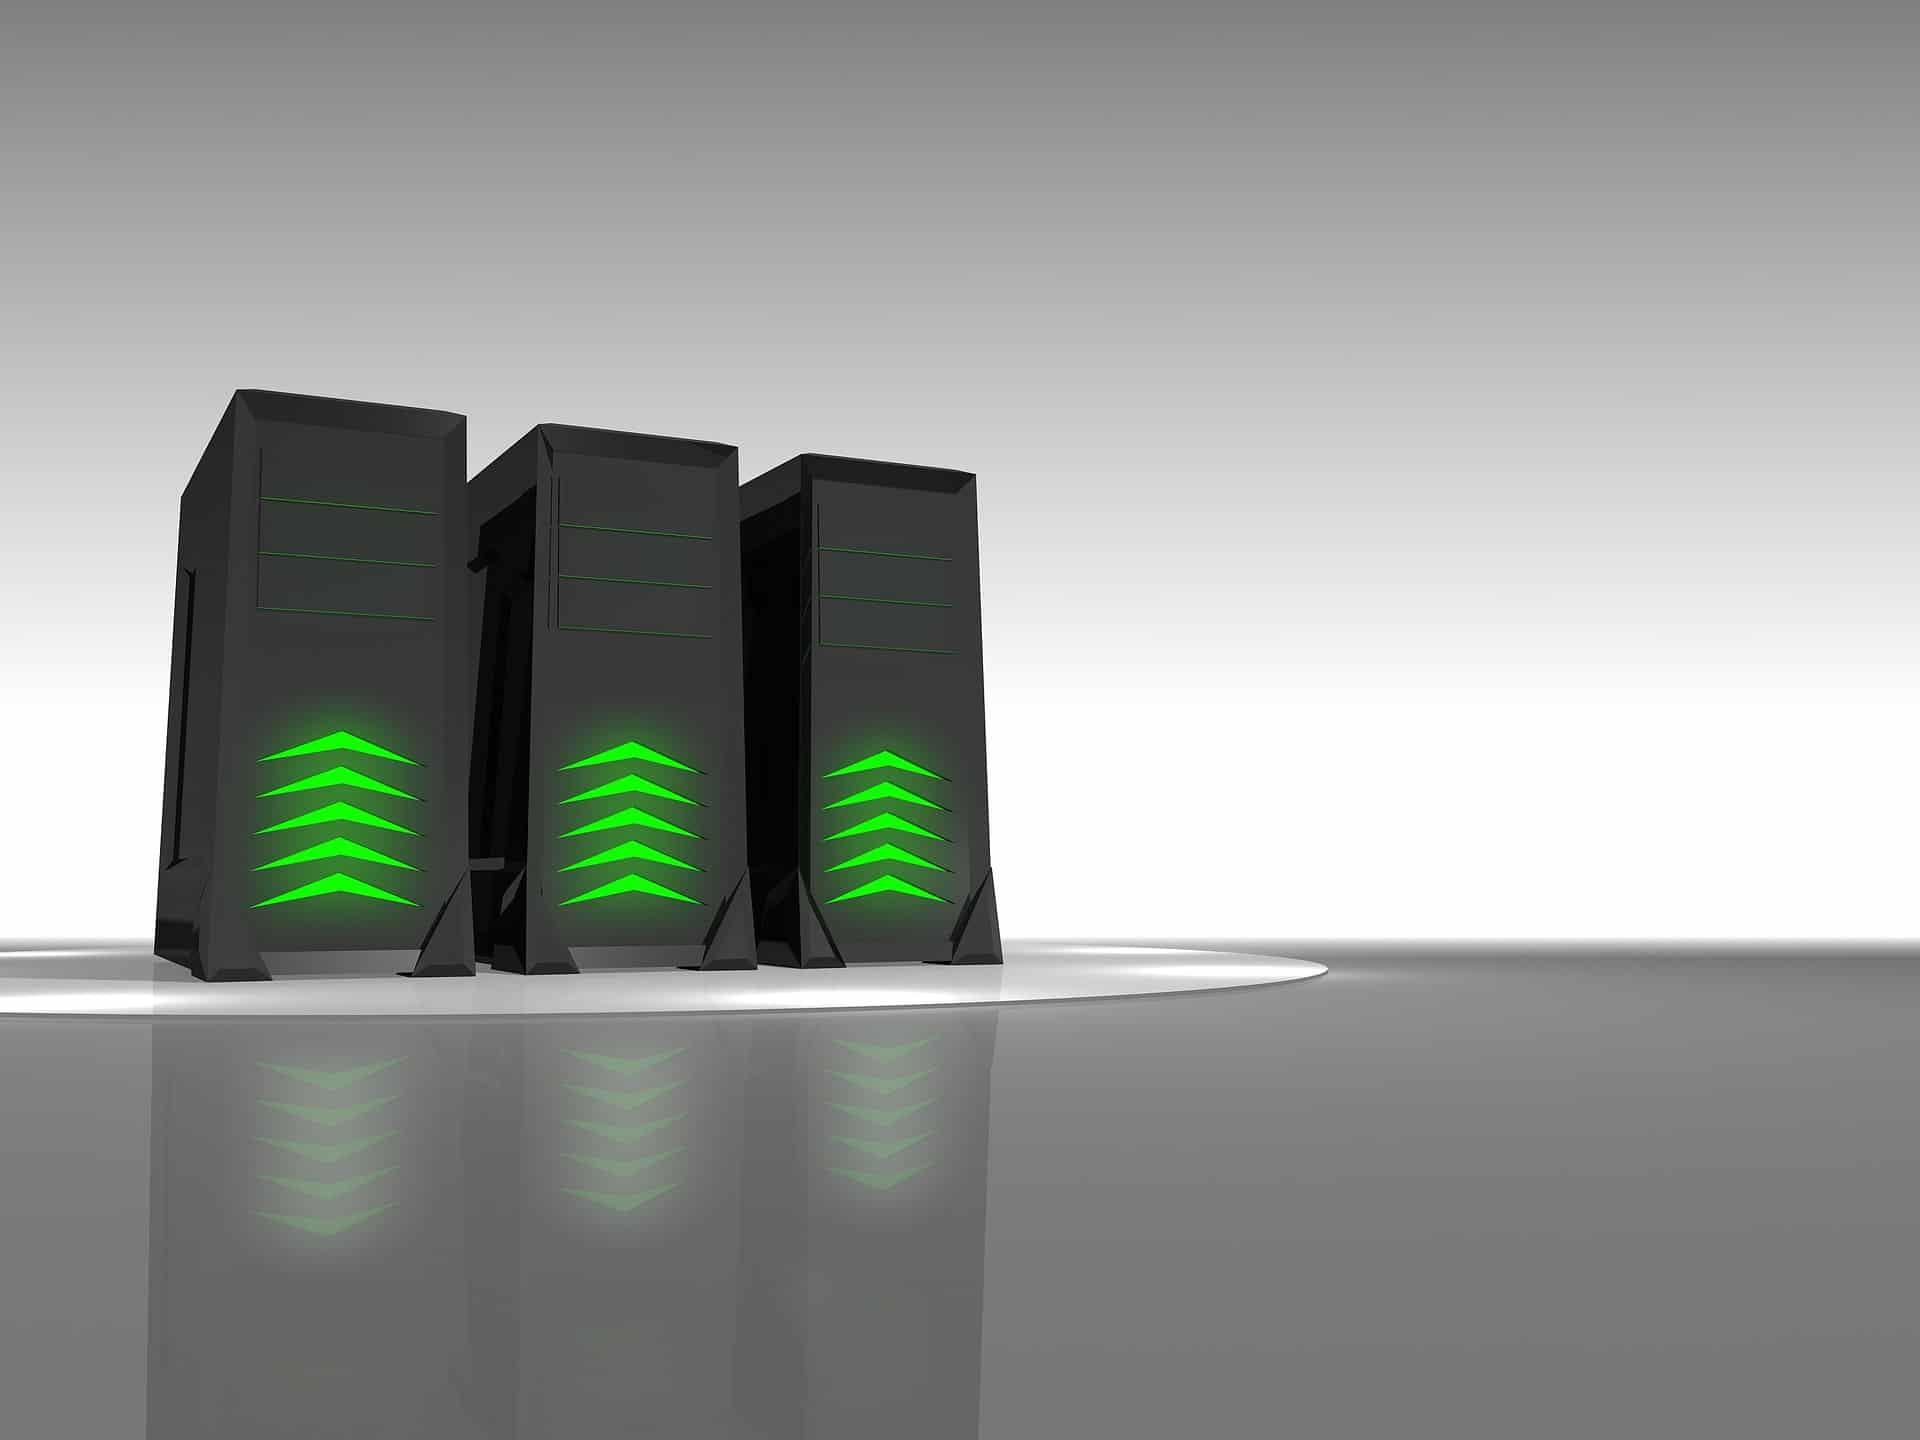 Servers via Pixabay